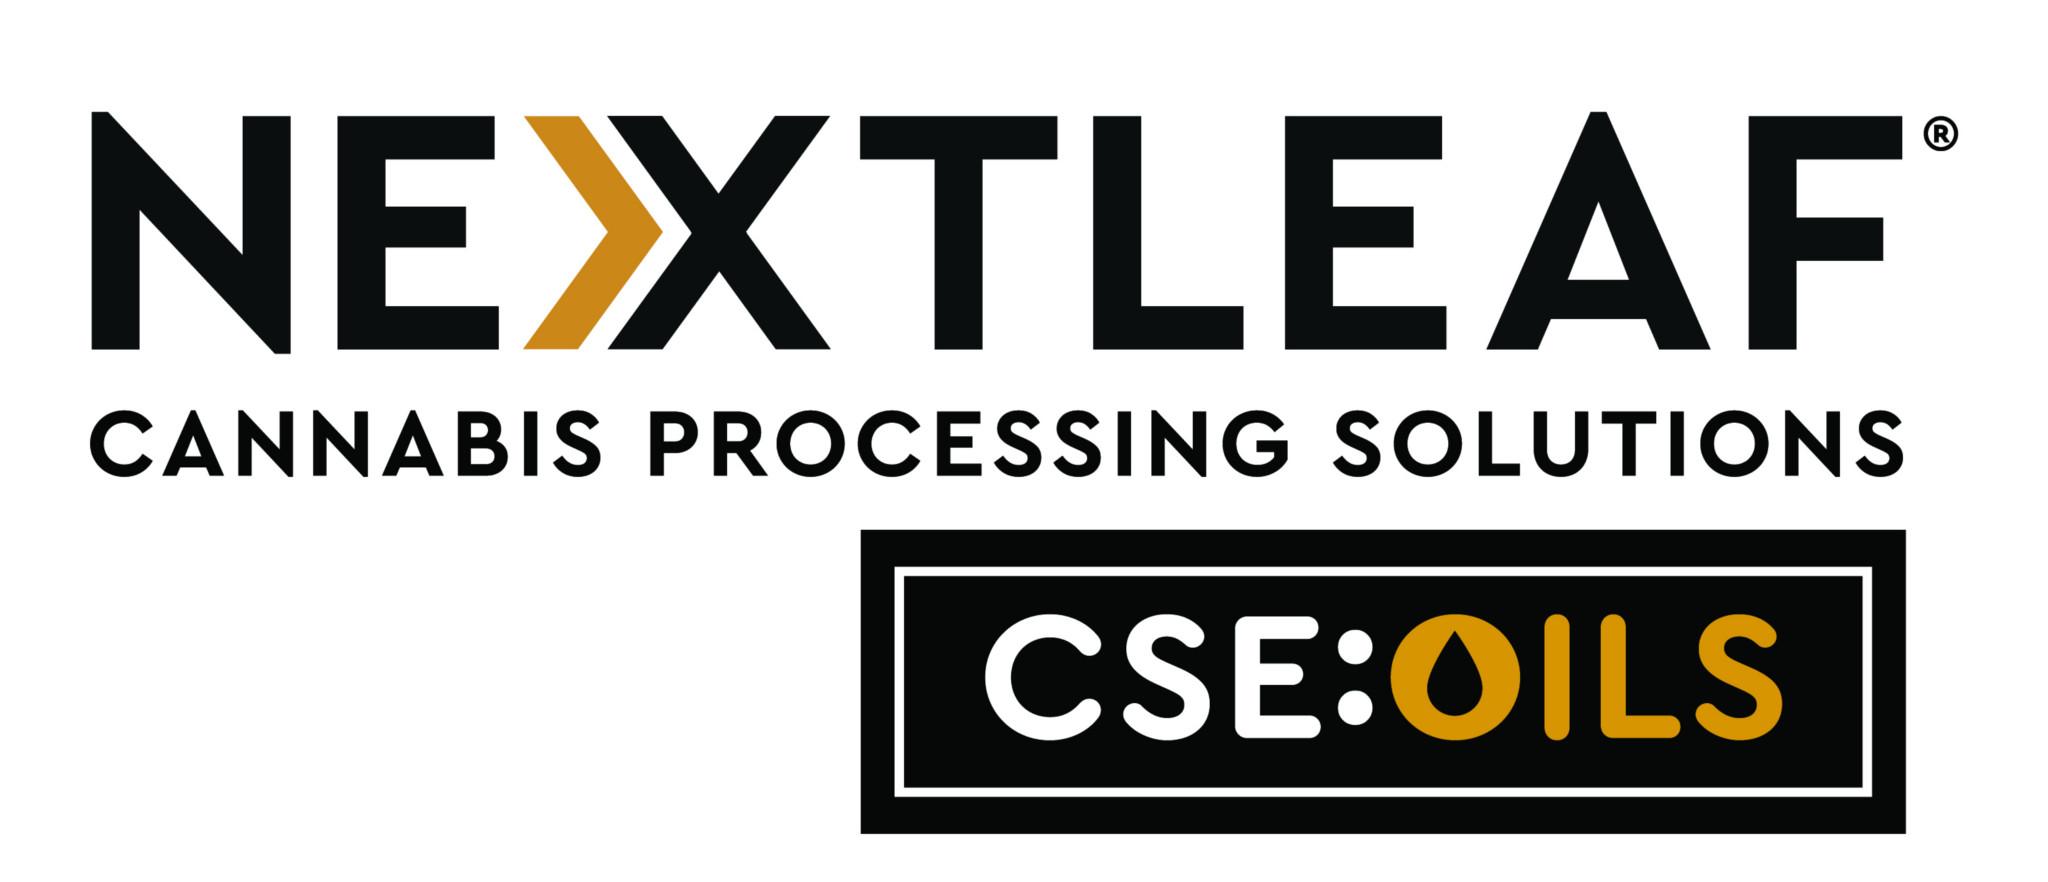 NextLeaf Solutions is a client of Natrinova Capital Inc.